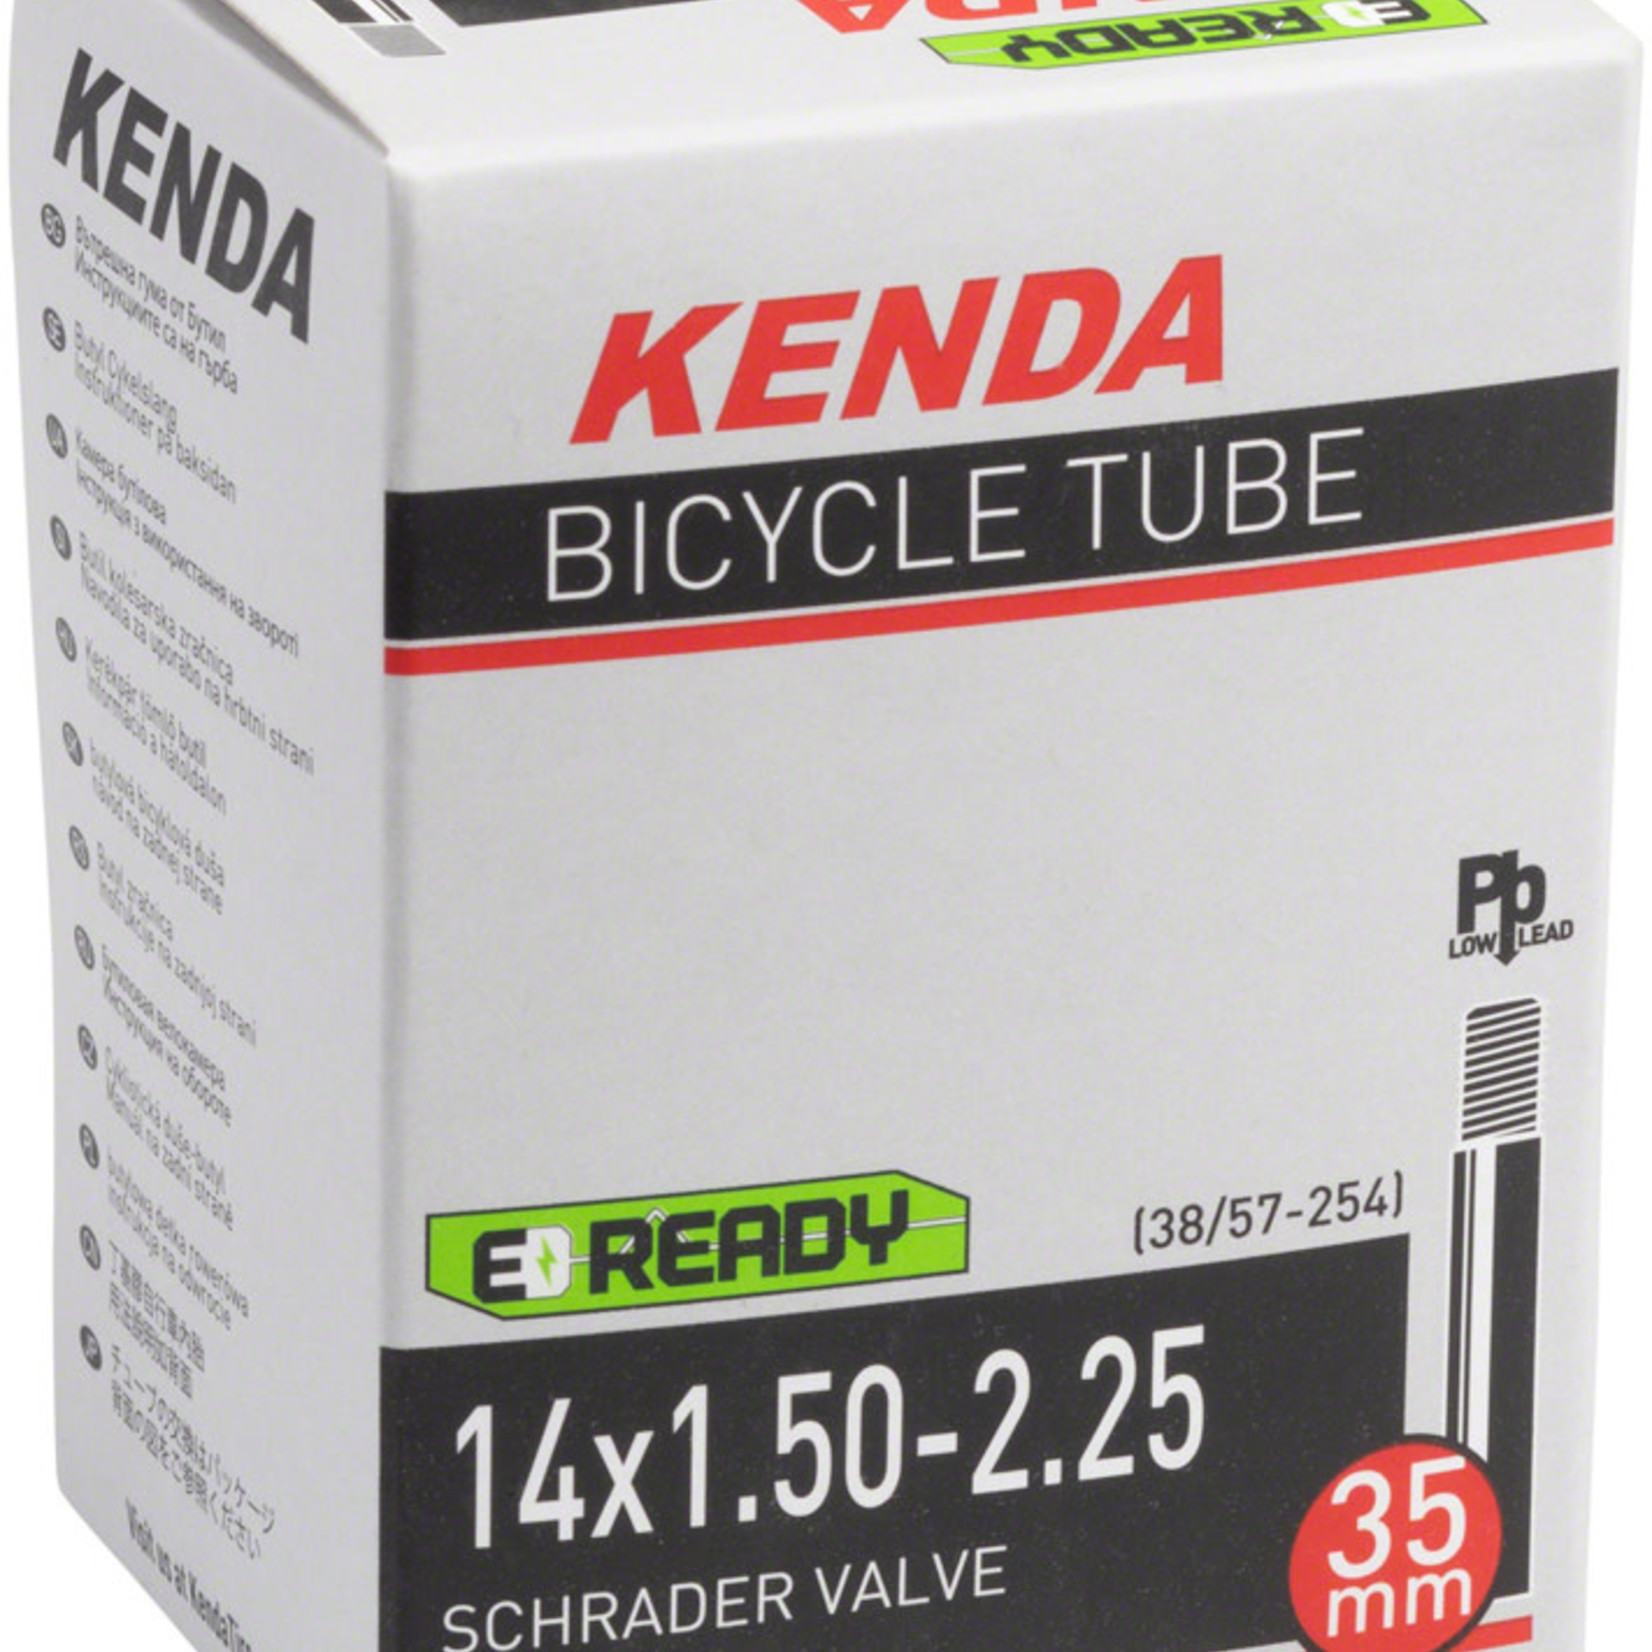 "Kenda Kenda 14 x 1.5-2.25"" SV Tube"